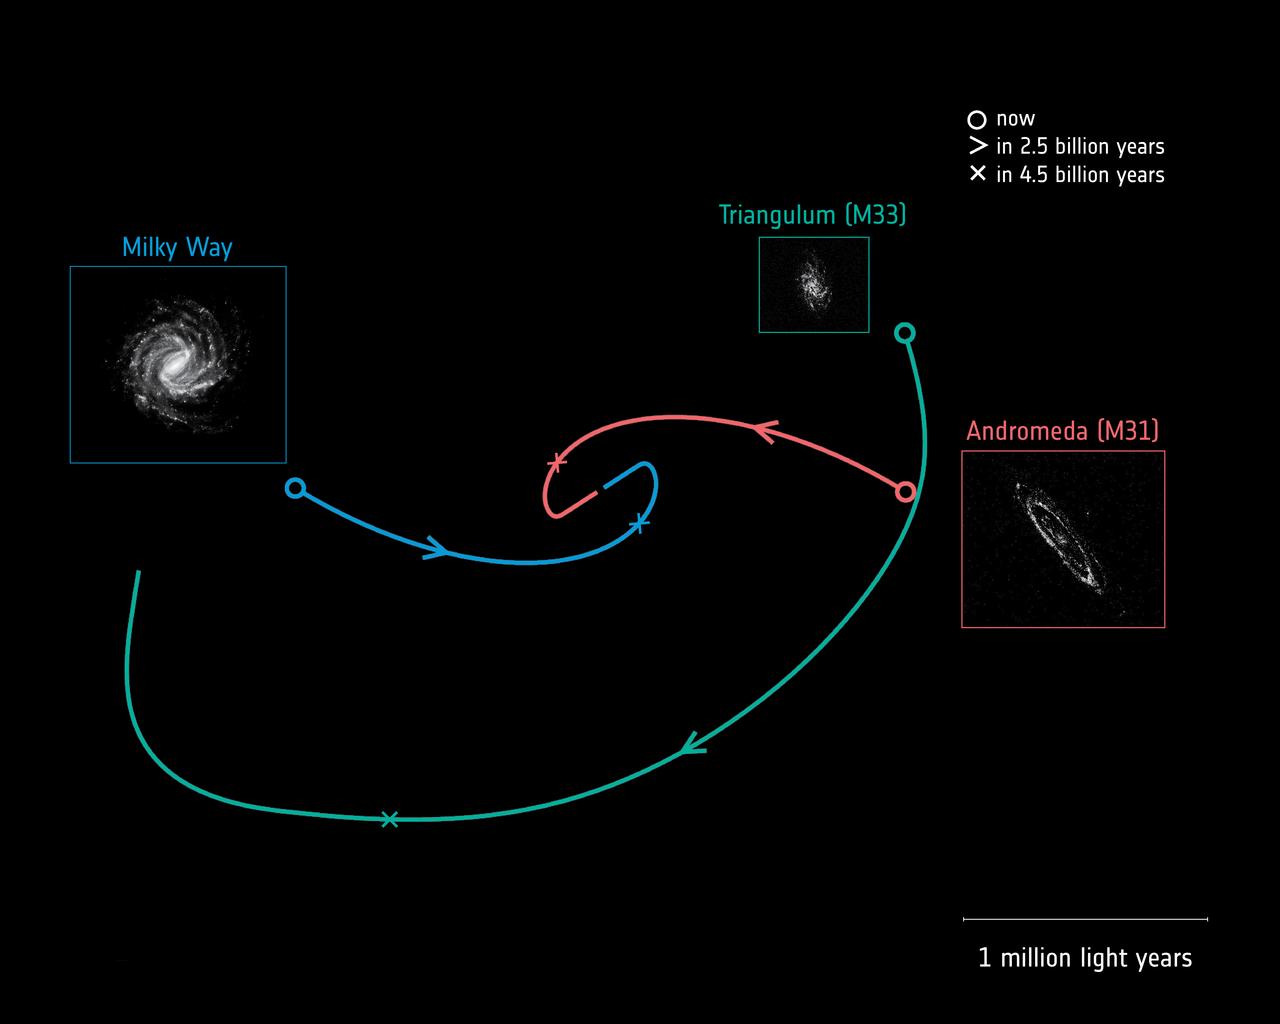 1567214199962-ESA_Gaia_MilkyWayAndromedaTriangulum_trajectories_1280.jpg